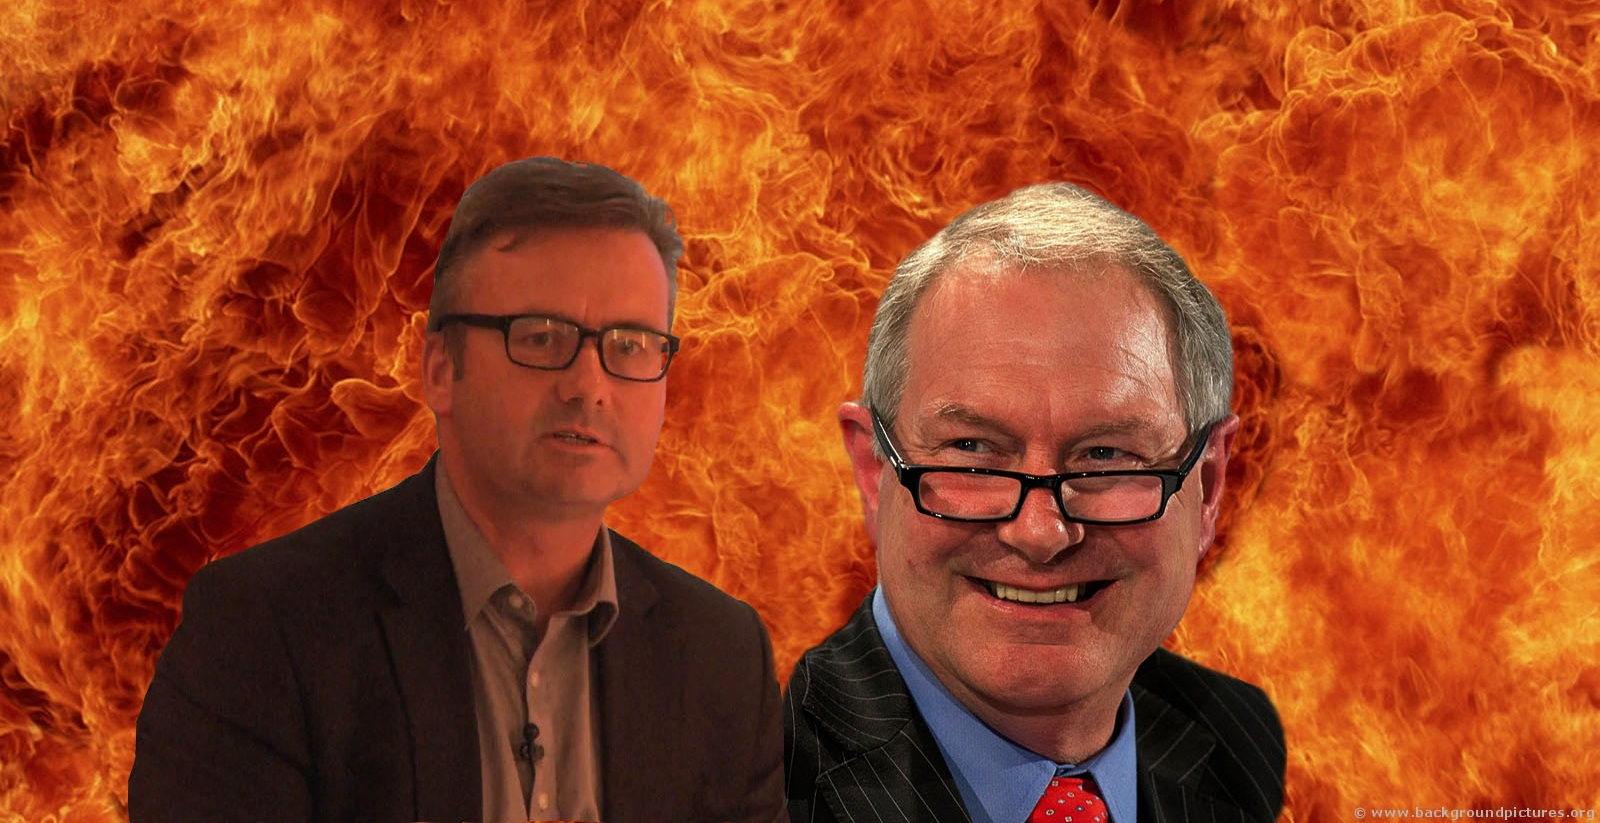 Roy GReenslade and john Battle, Quizmasters